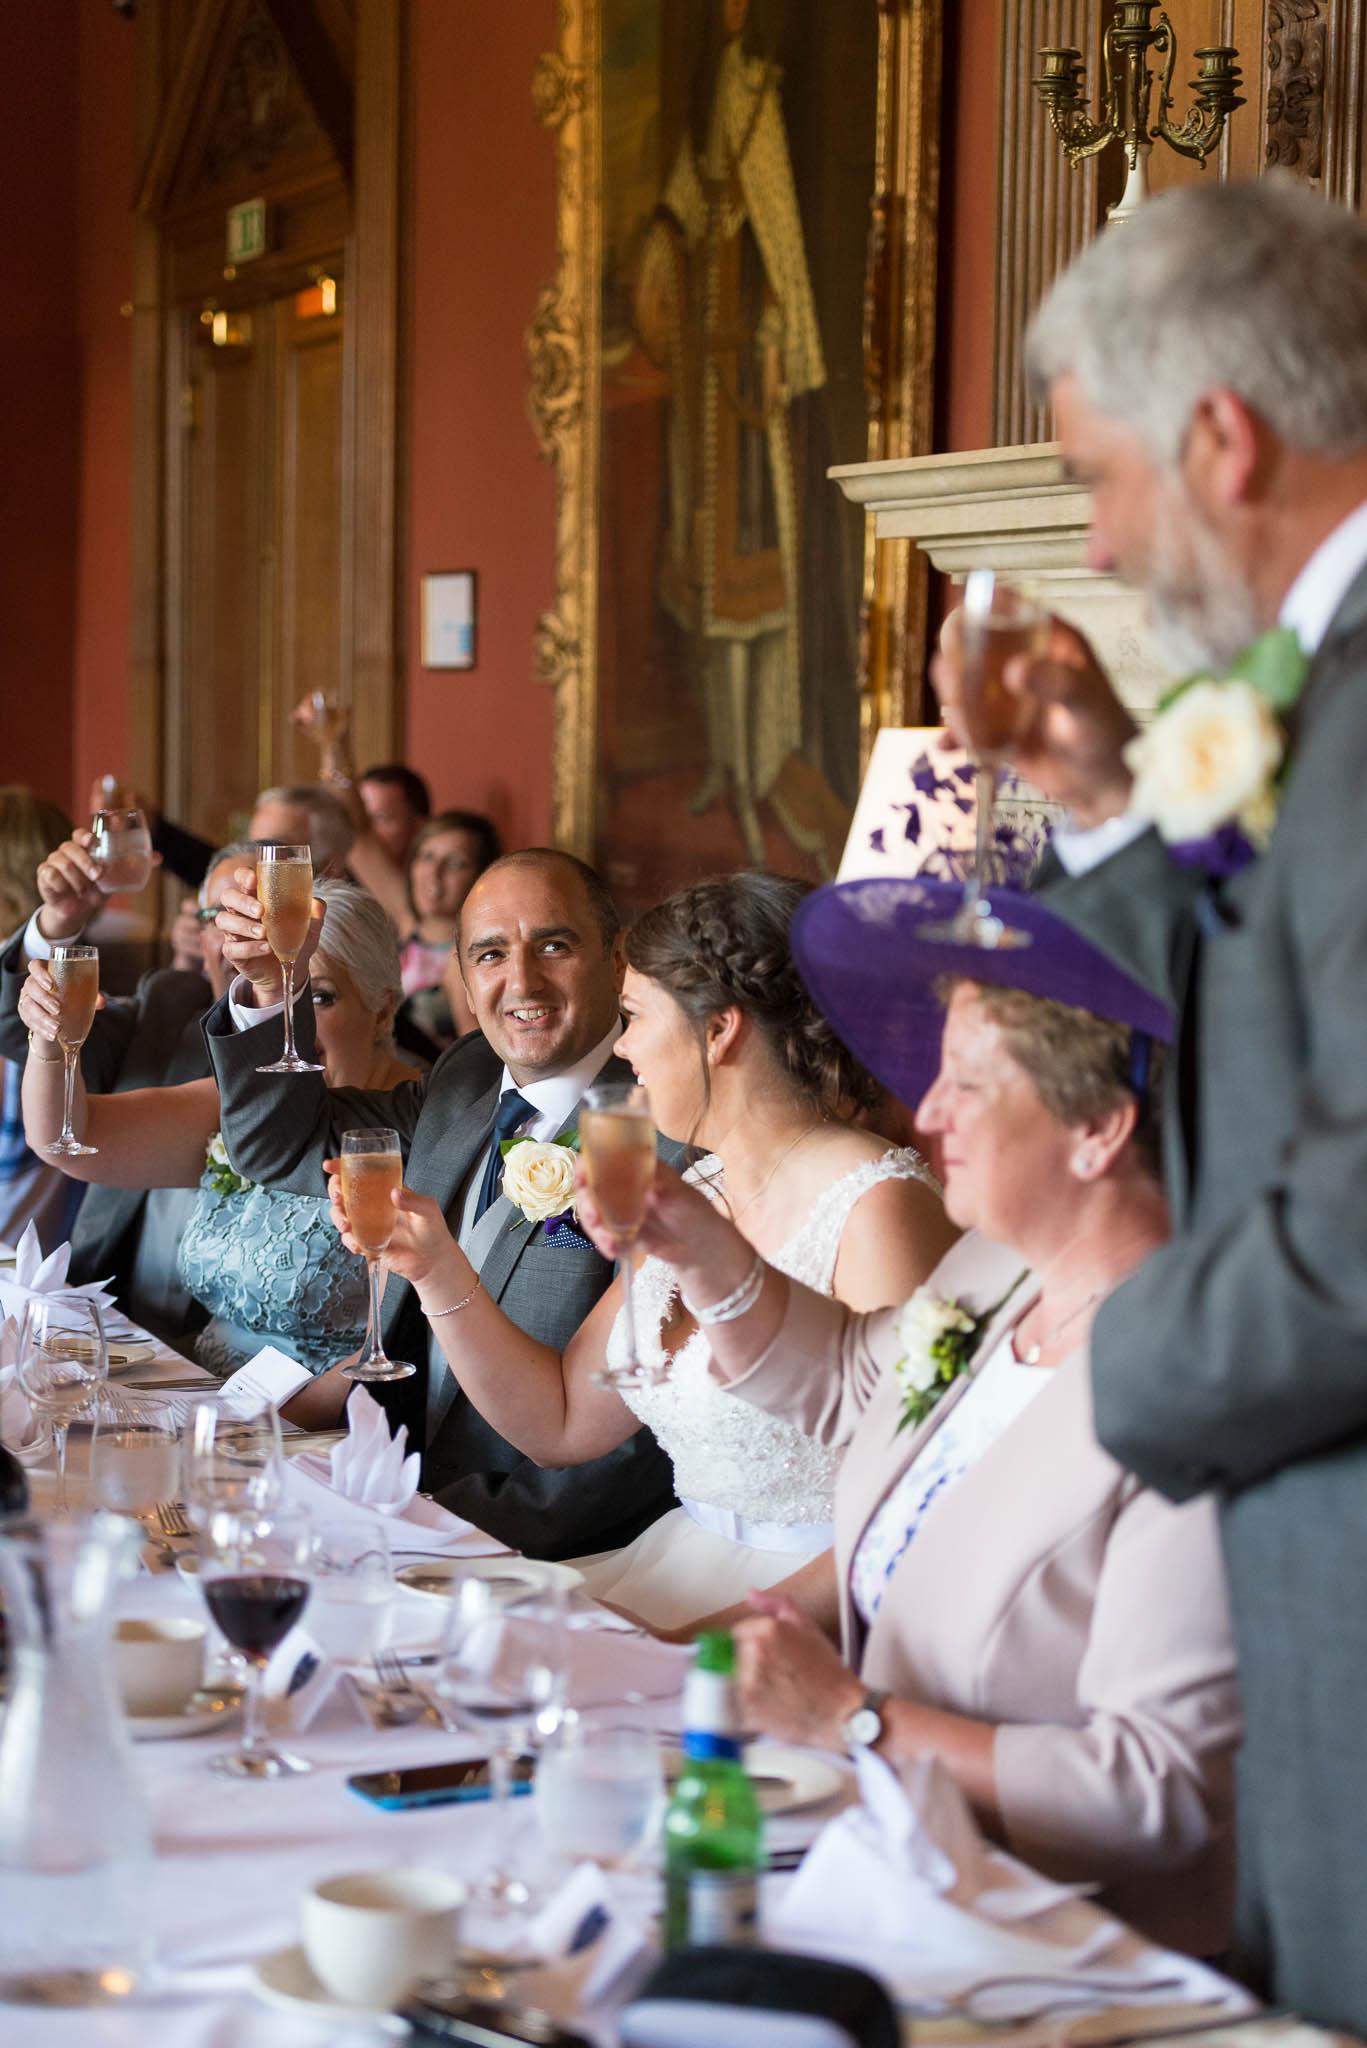 Crathorne Hall Hotel Wedding Photographer79.jpg